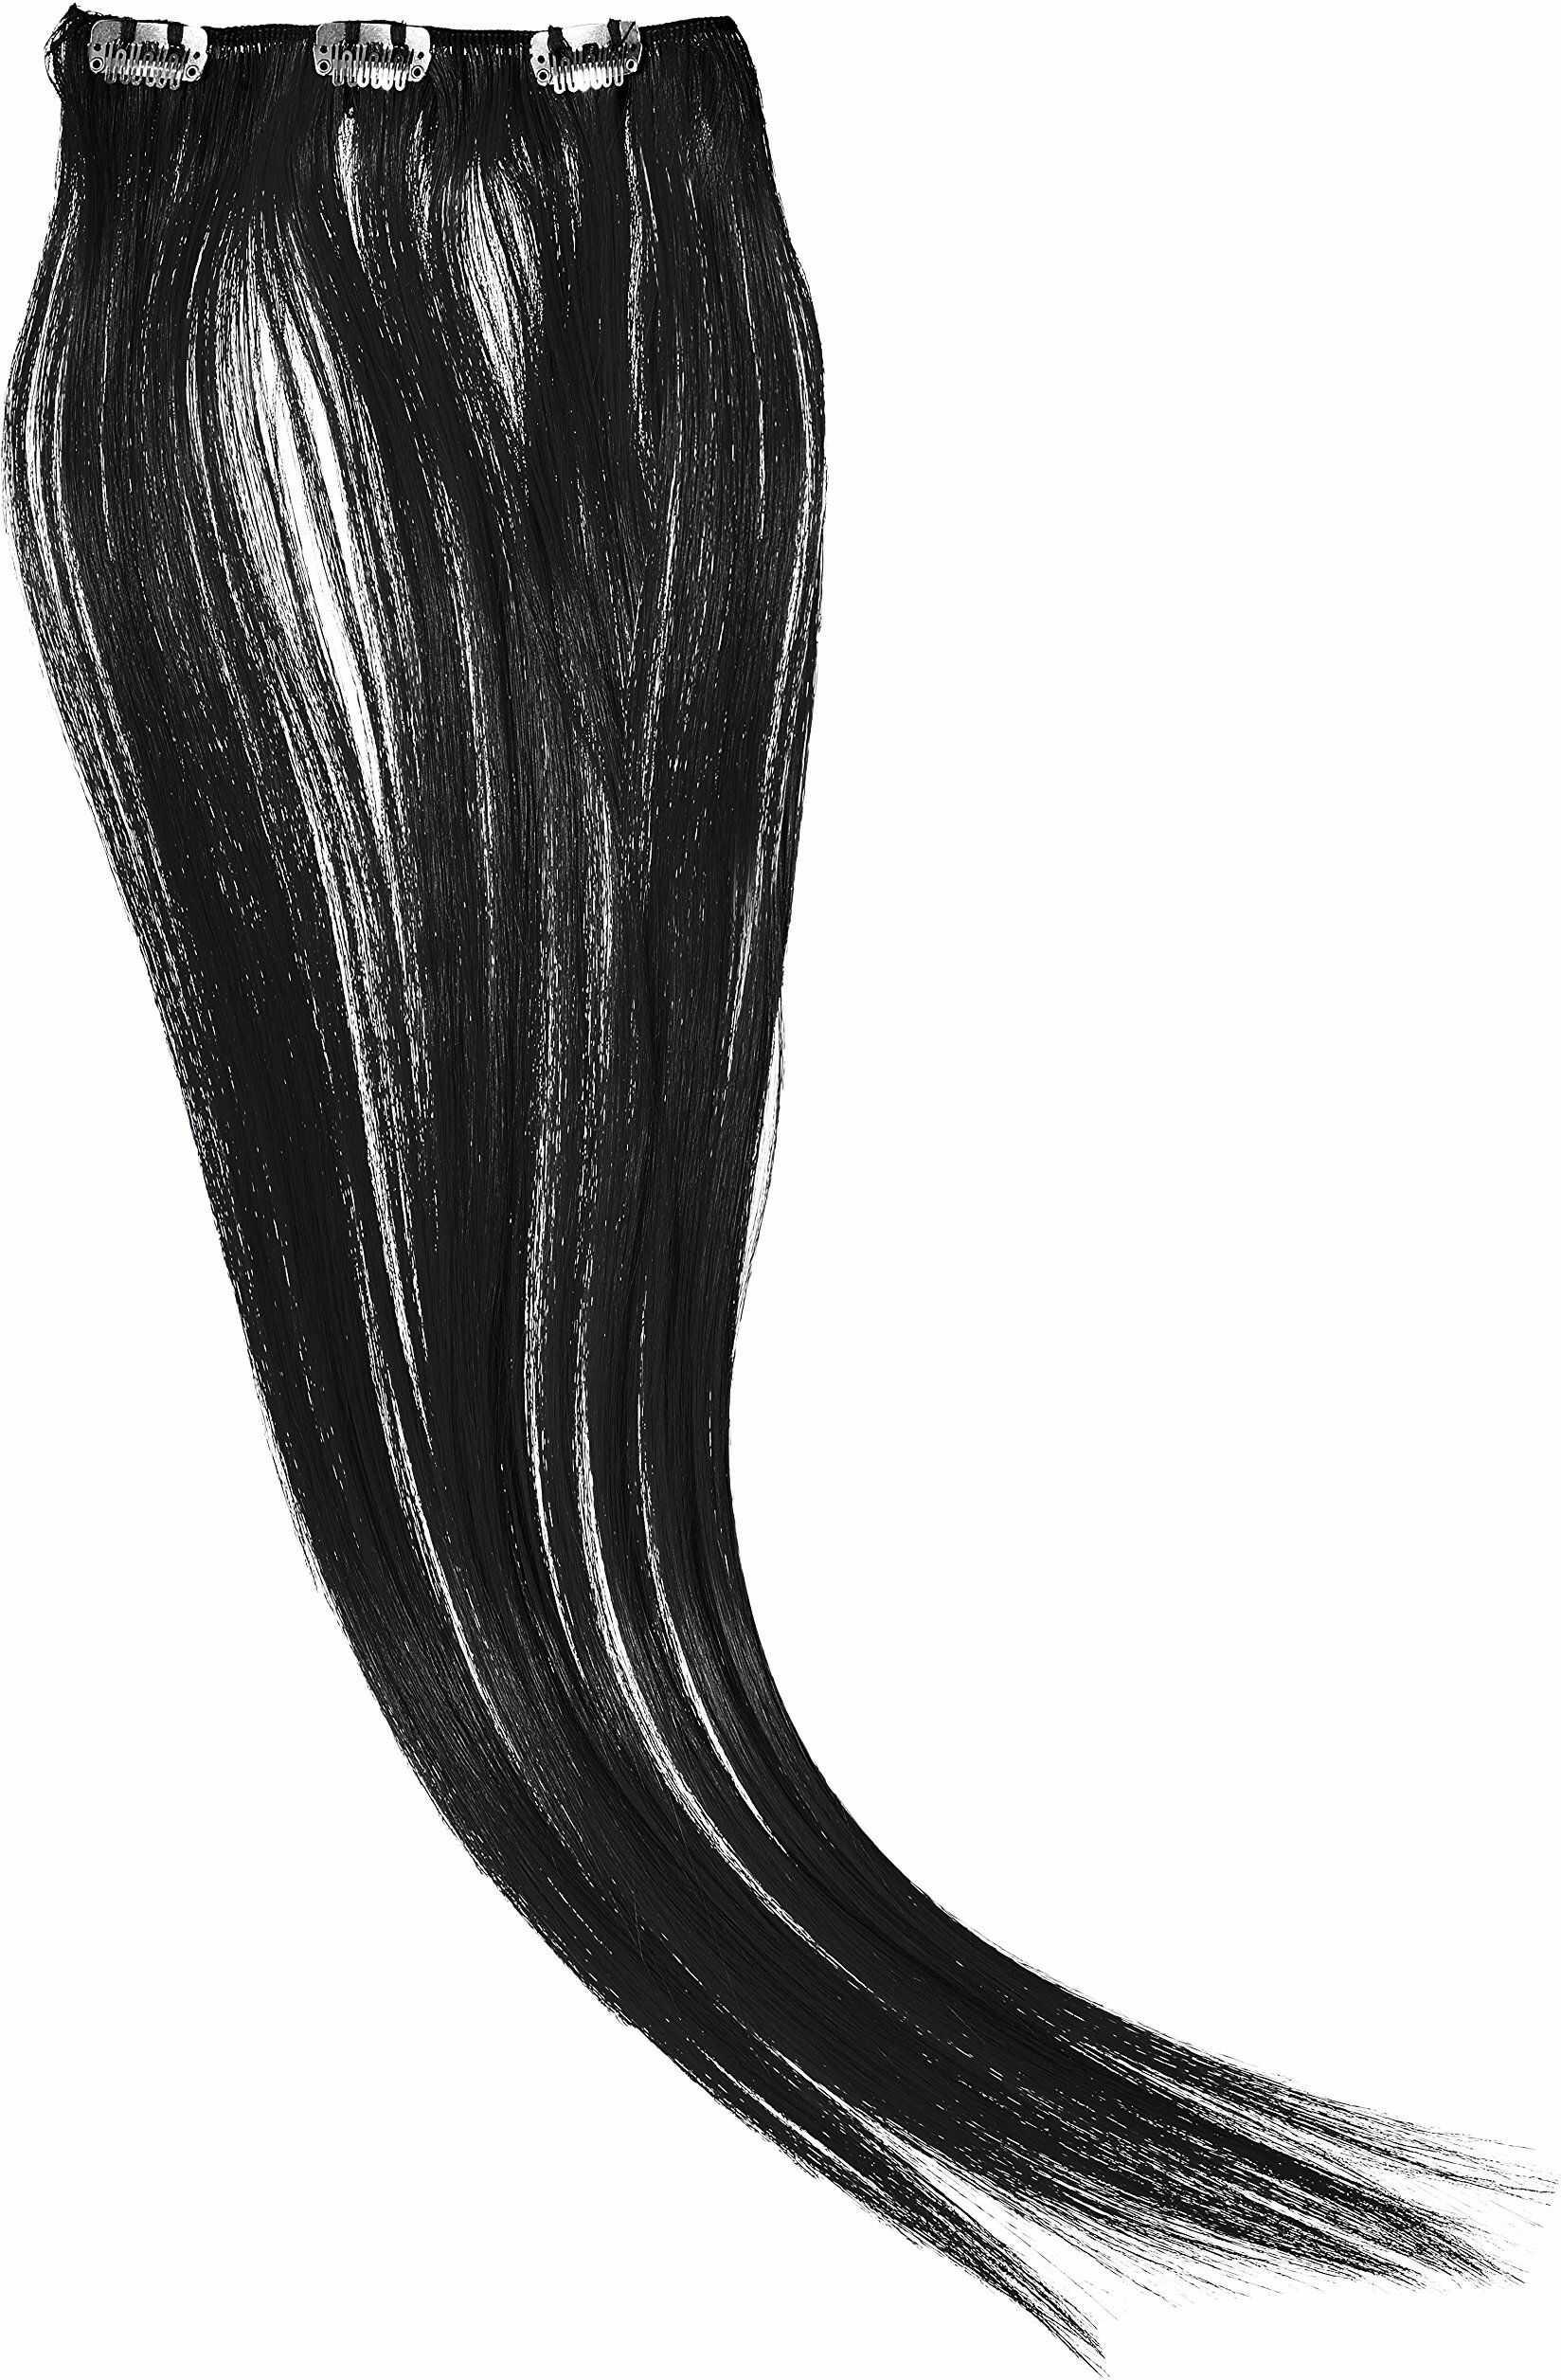 Hairaisers Clip and Go Extensions, 45 cm sztuczne włosy, czarne, 1 sztuka